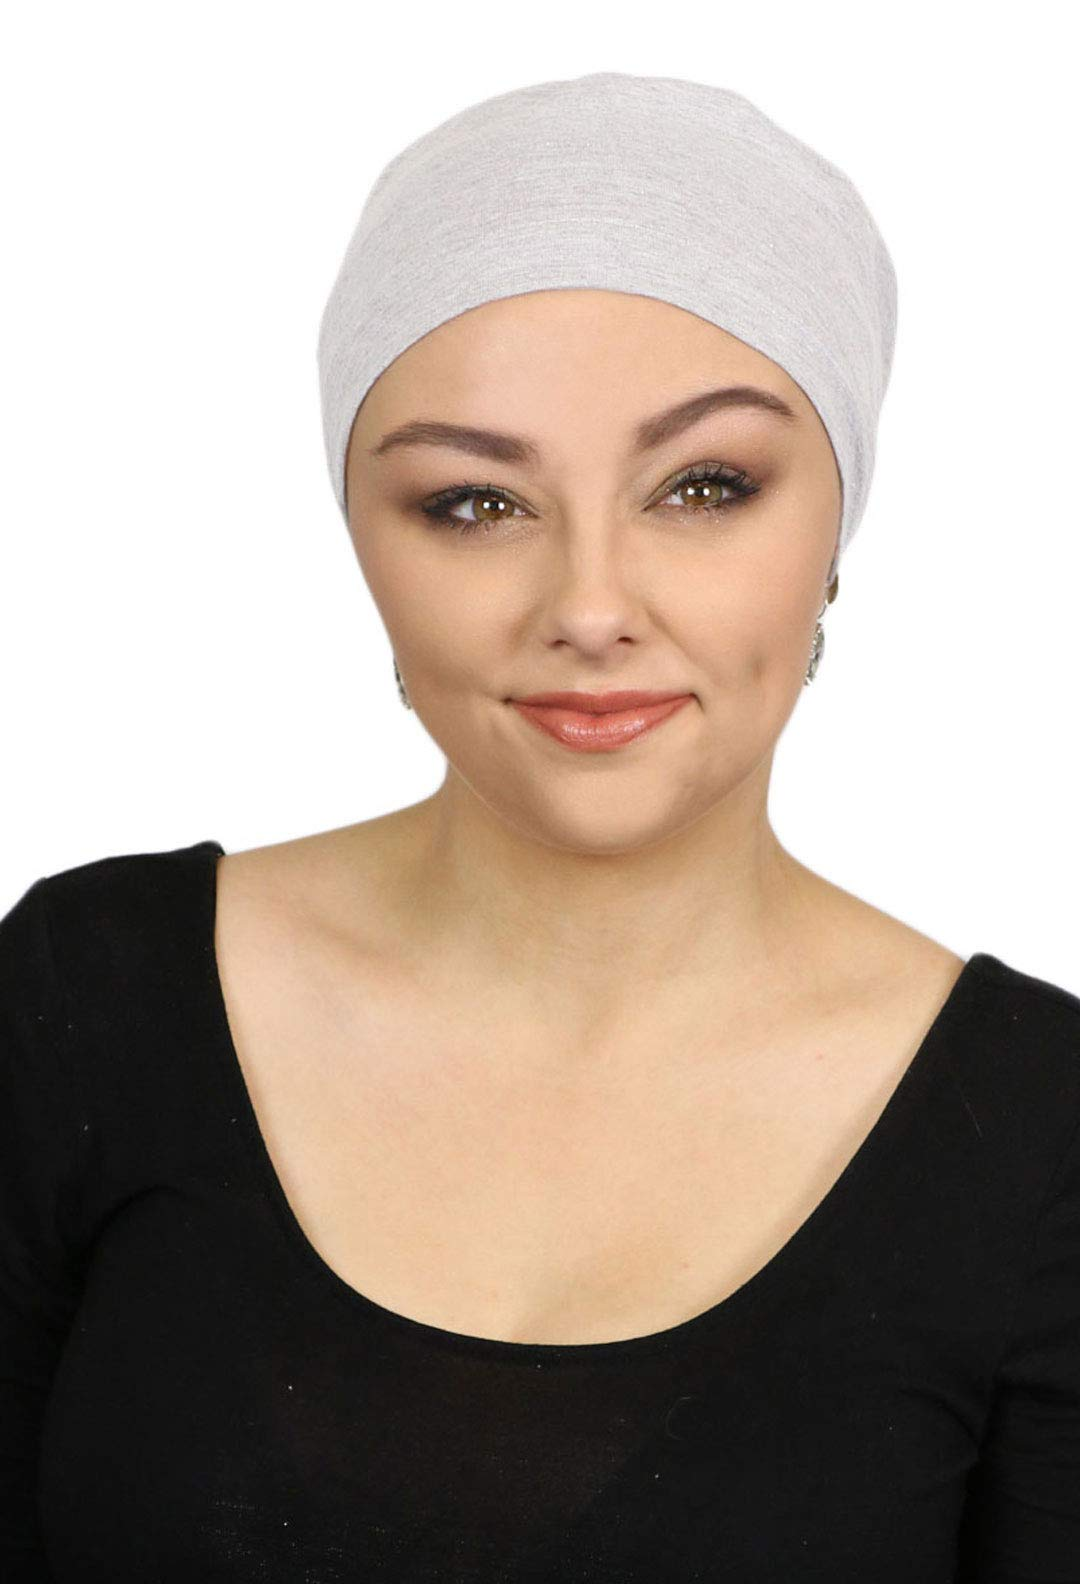 Sleep Cap Chemo Hat Cancer Headwear for Women Sleeping Night Beanie Head Coverings Turbans Hair Loss Serena (White Heather)